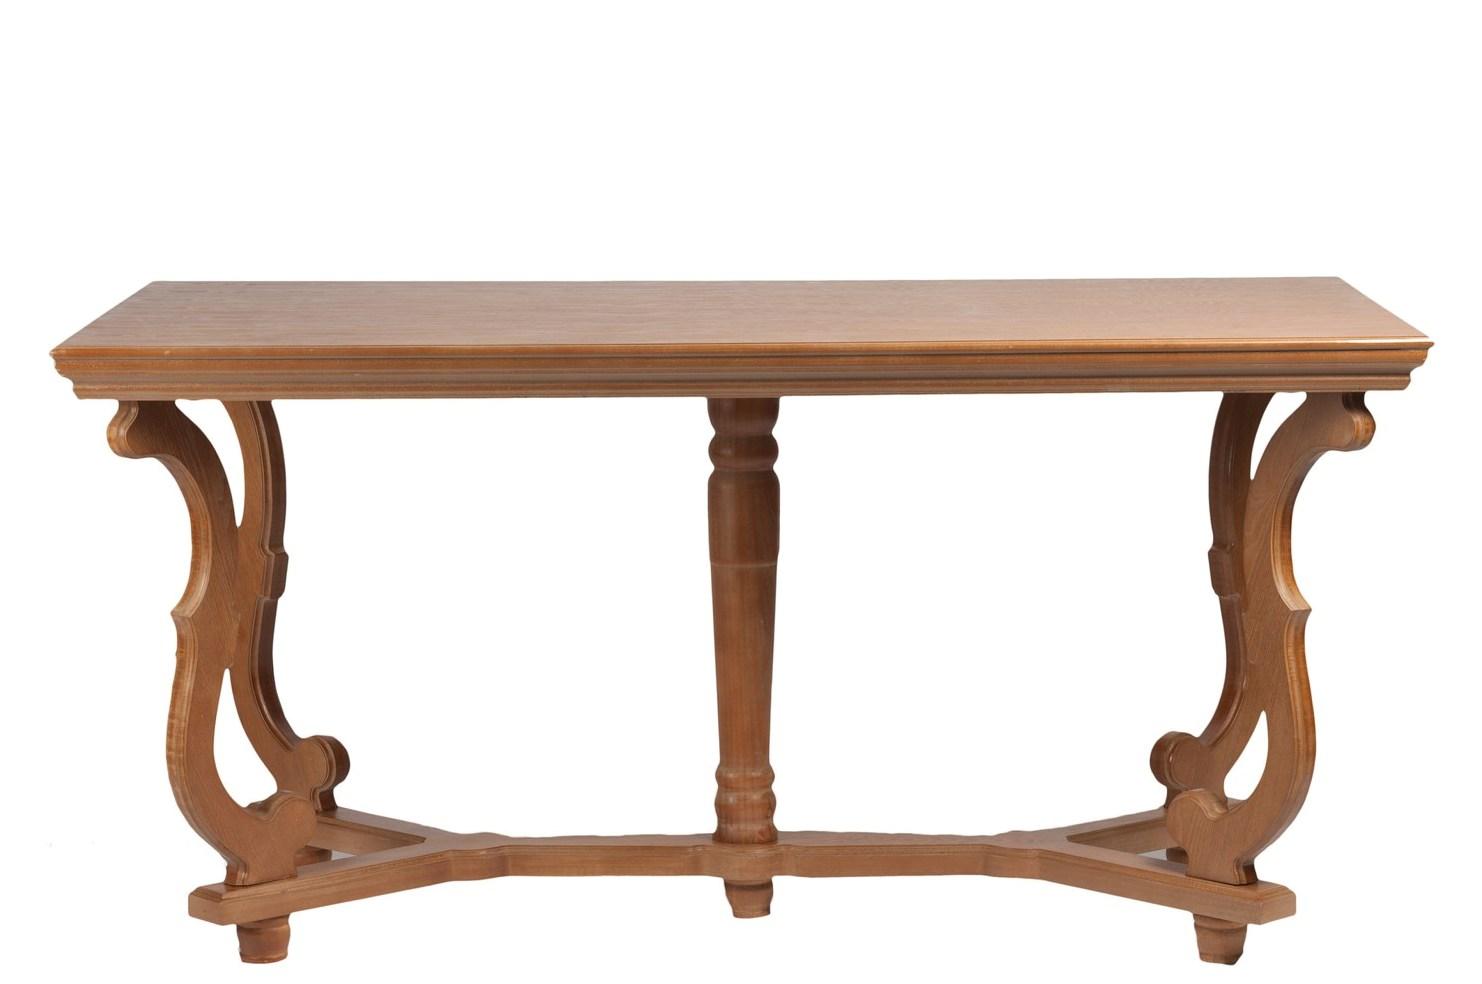 DG-HOME Обеденный стол Bogen стол обеденный dg home hardwood grande dg f tb98 1